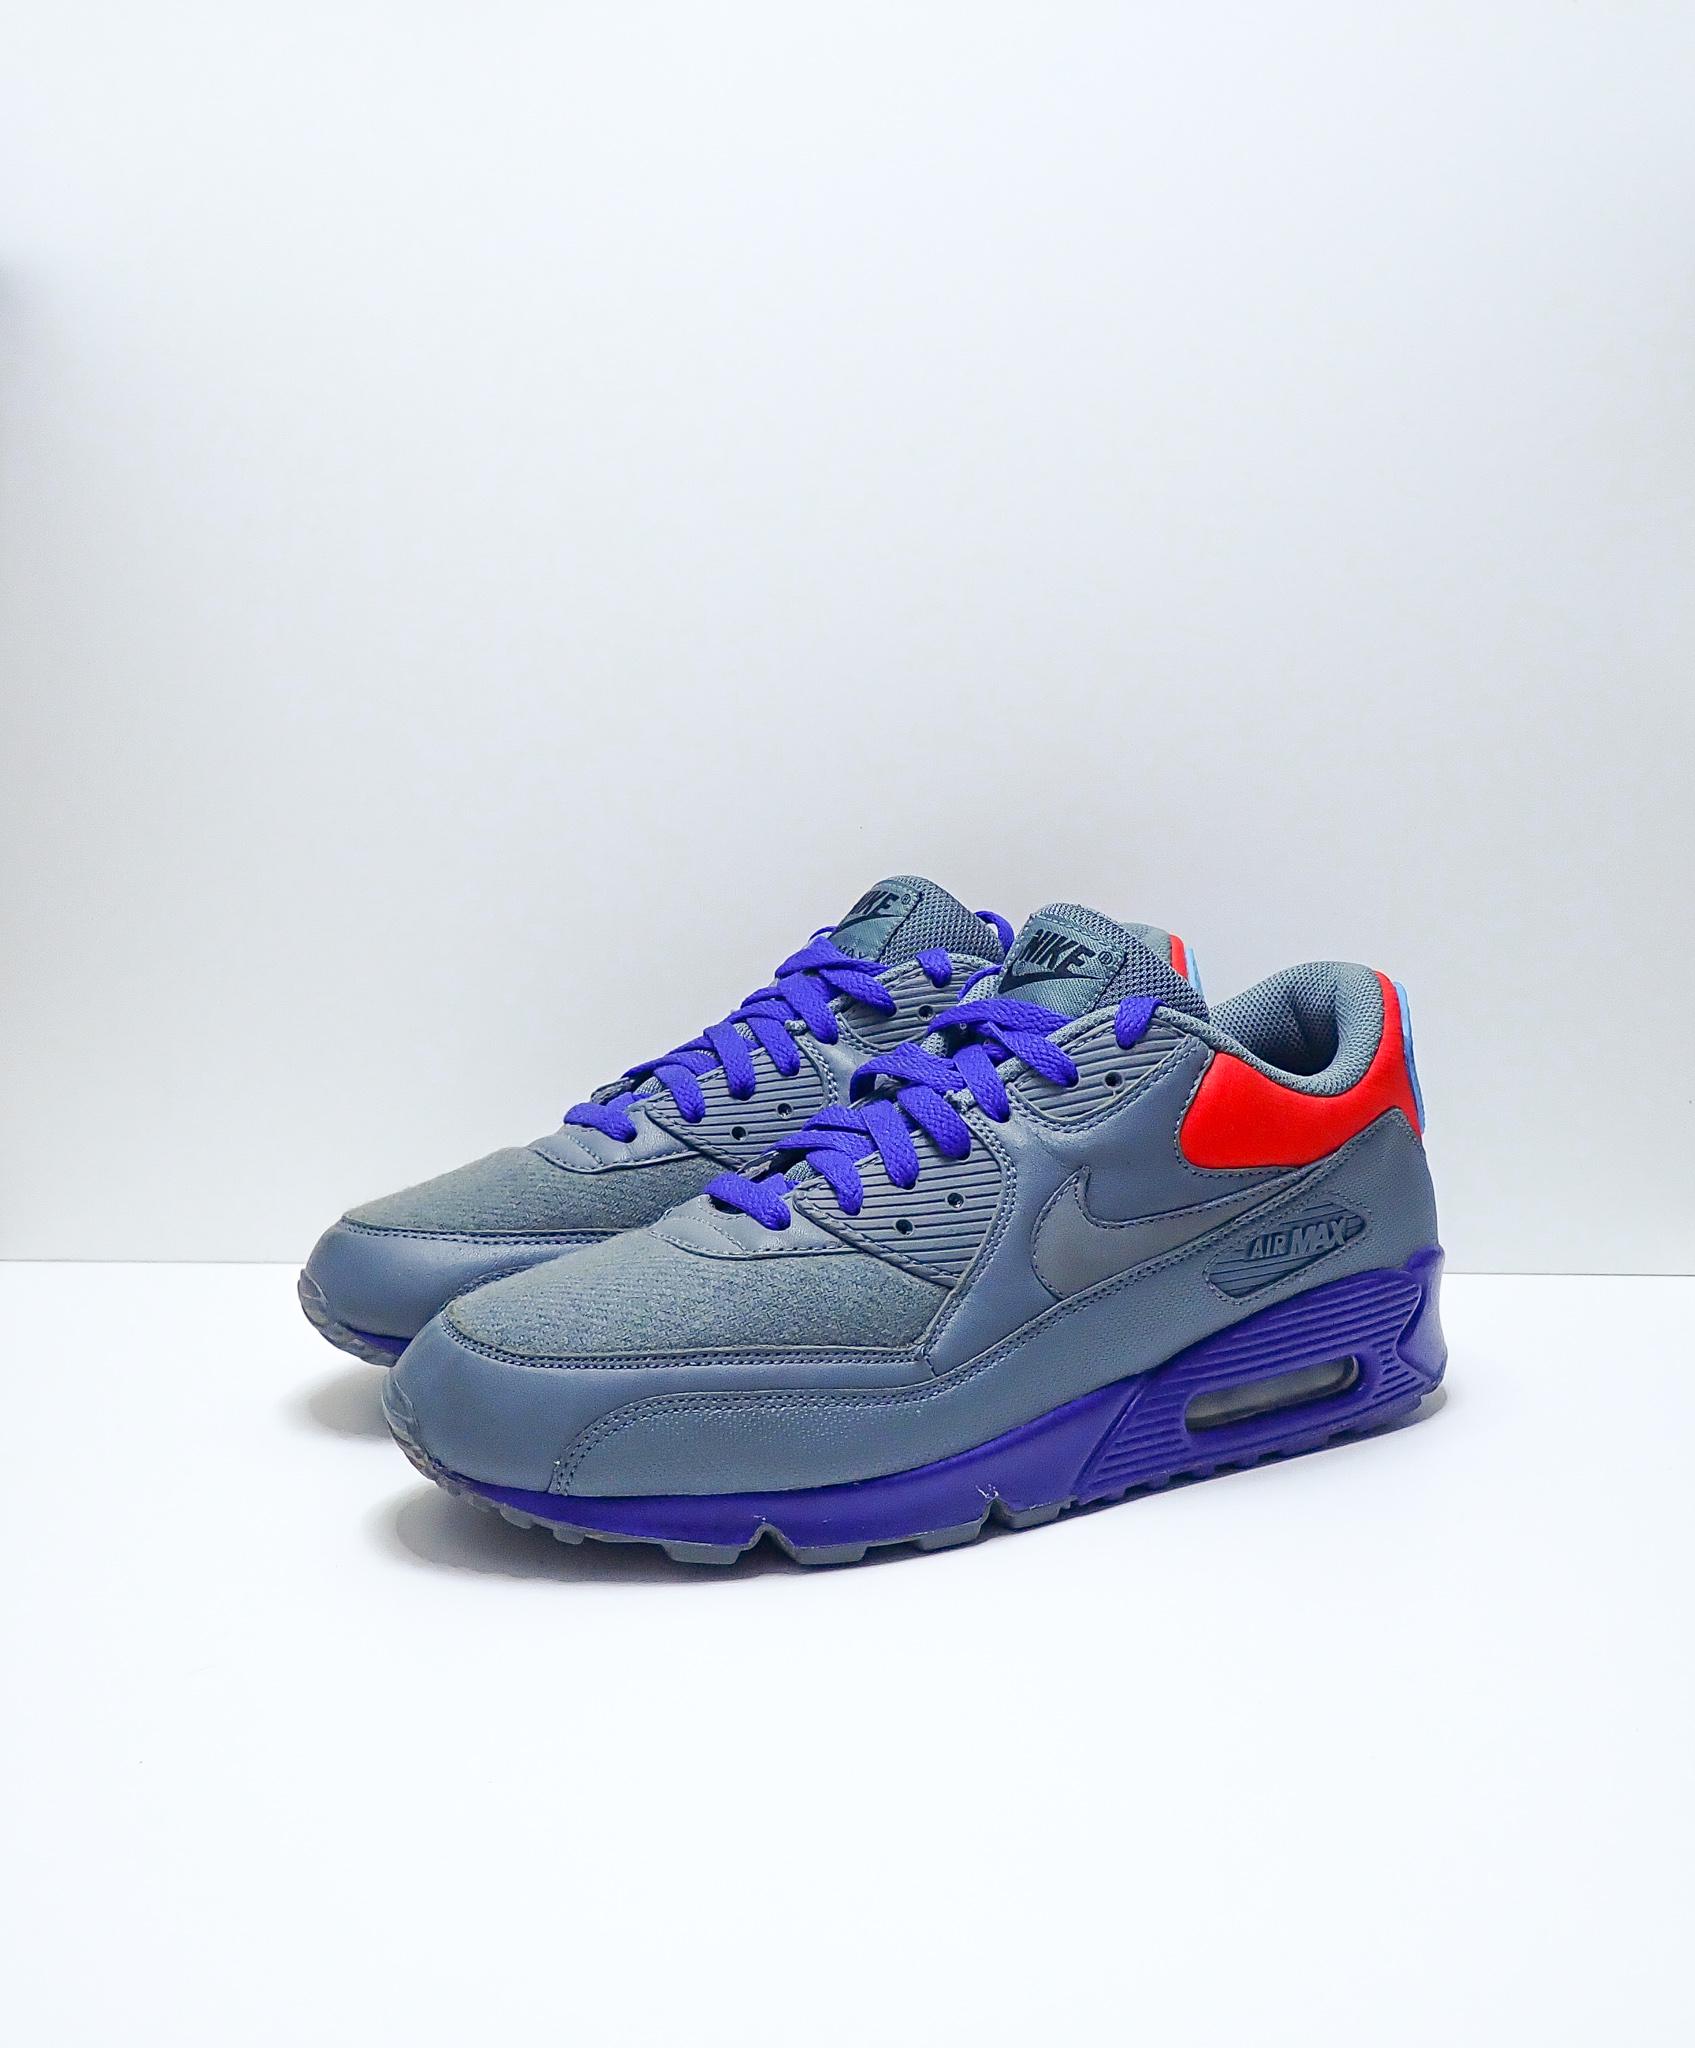 Nike Air Max 90 Shagmeister Pack Grey